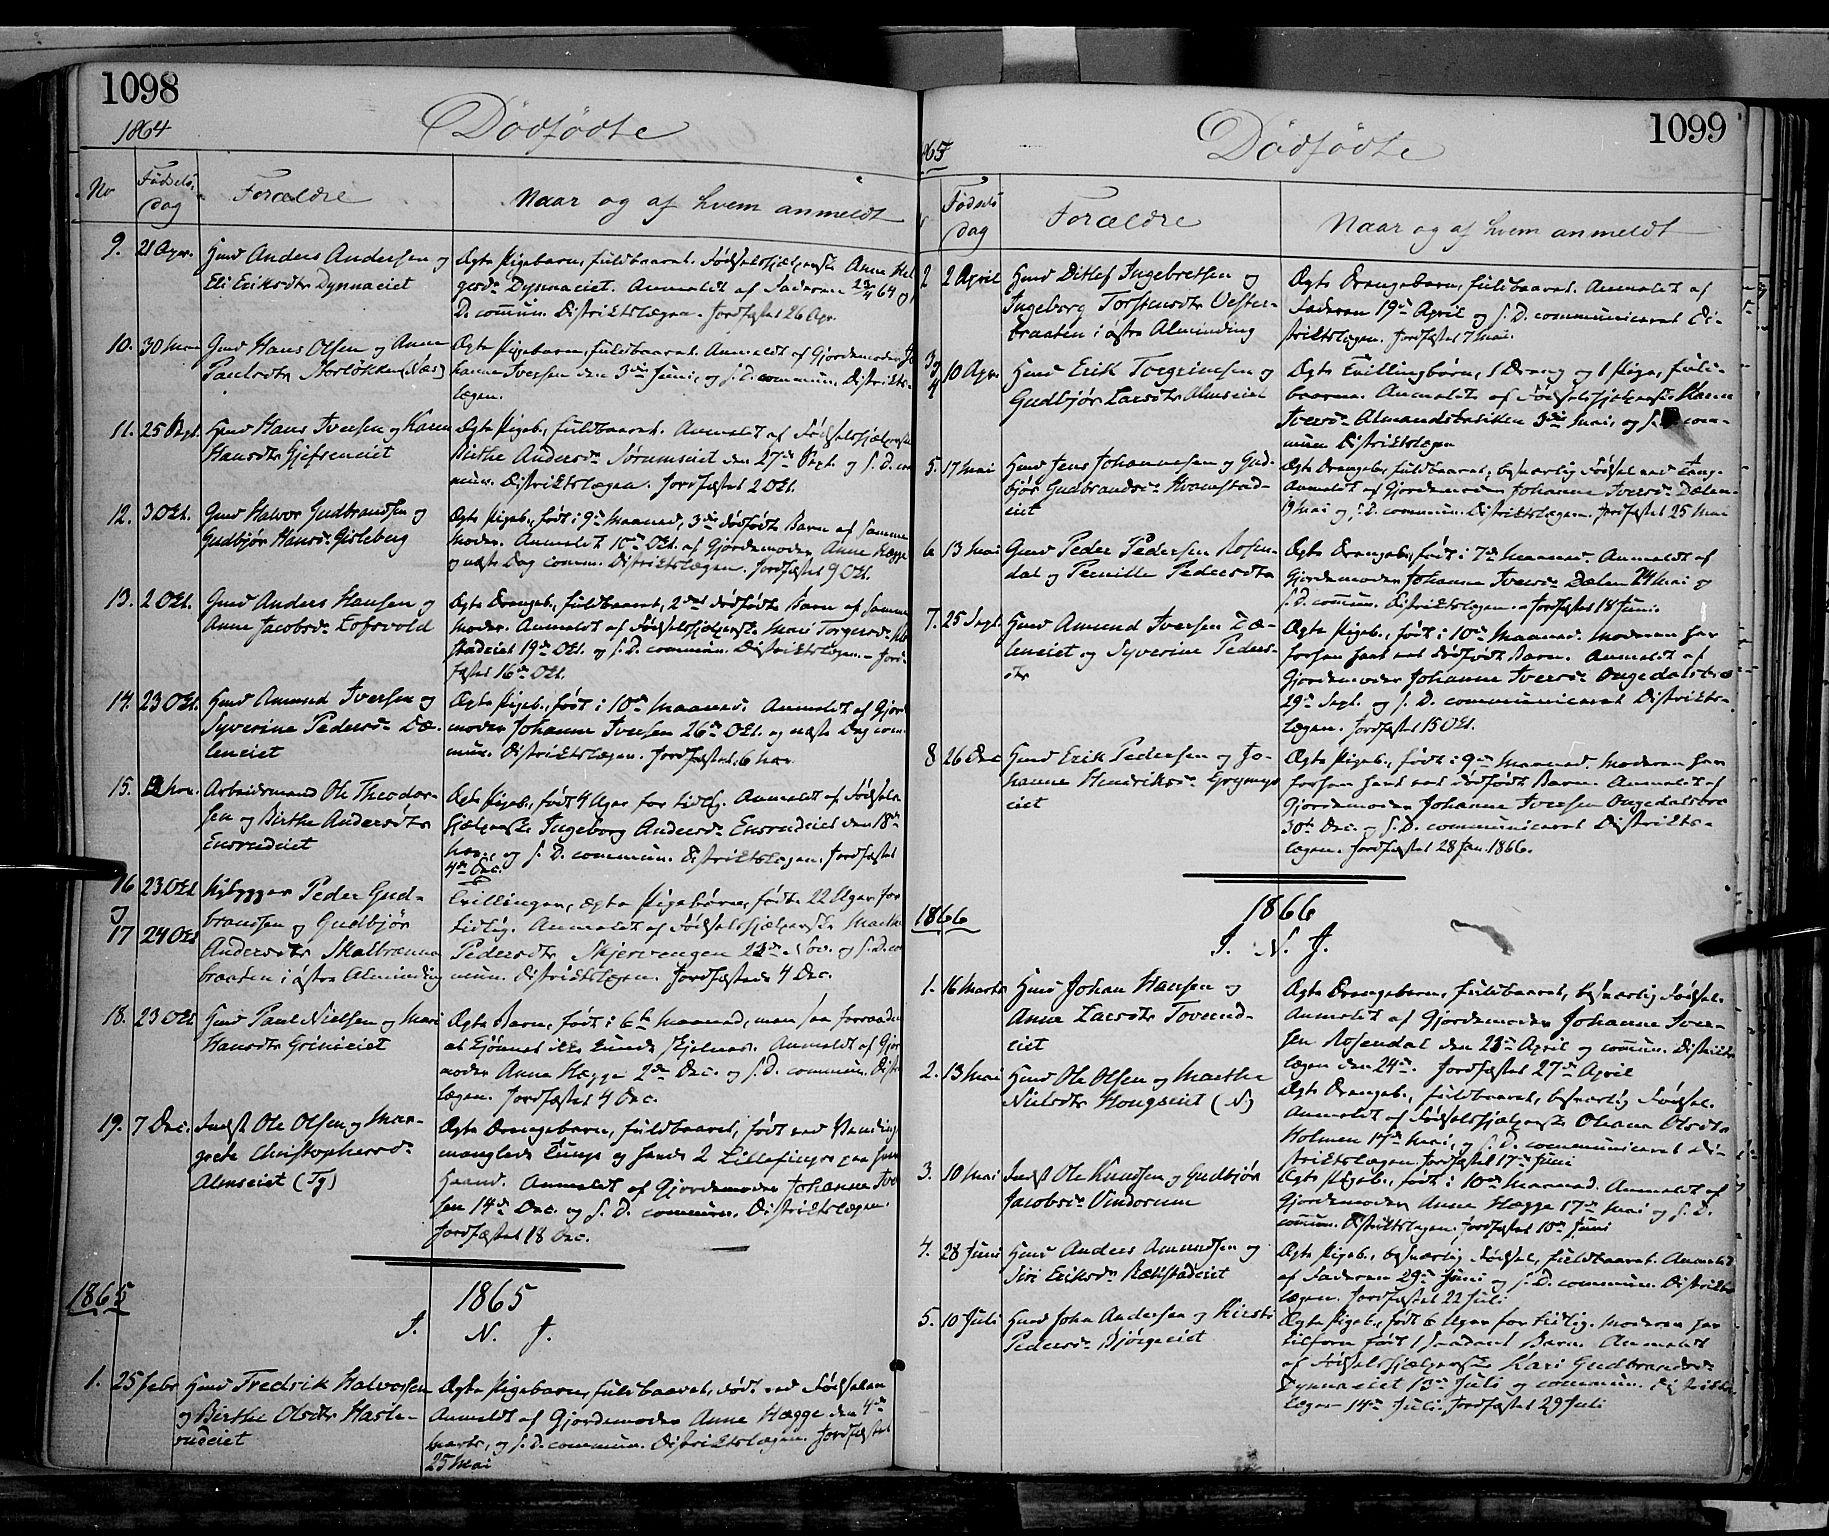 SAH, Gran prestekontor, Ministerialbok nr. 12, 1856-1874, s. 1098-1099